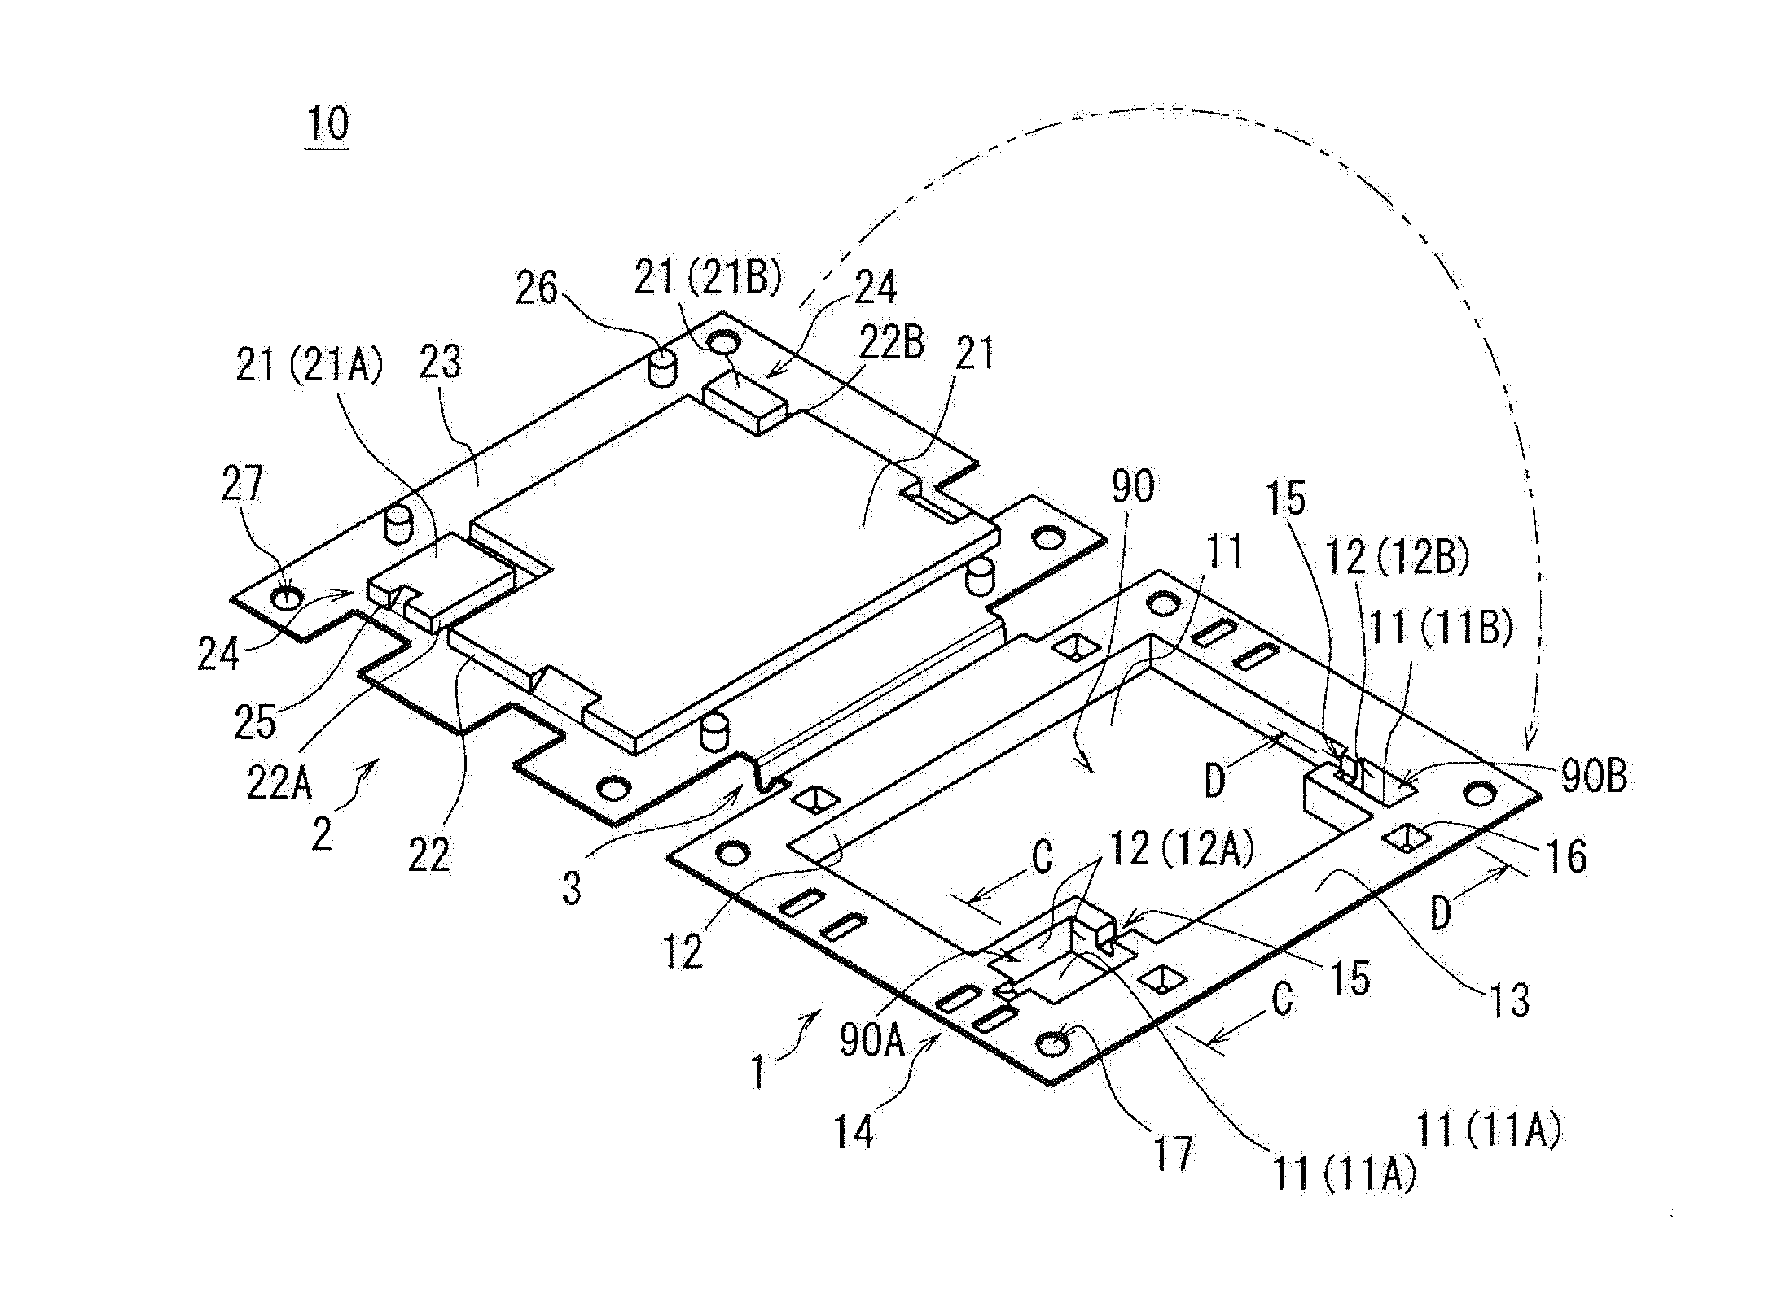 hight resolution of fahrenheit baseboard heaters wiring diagram fahrenheit electric baseboard heater wiring diagram marley baseboard heater wiring diagram